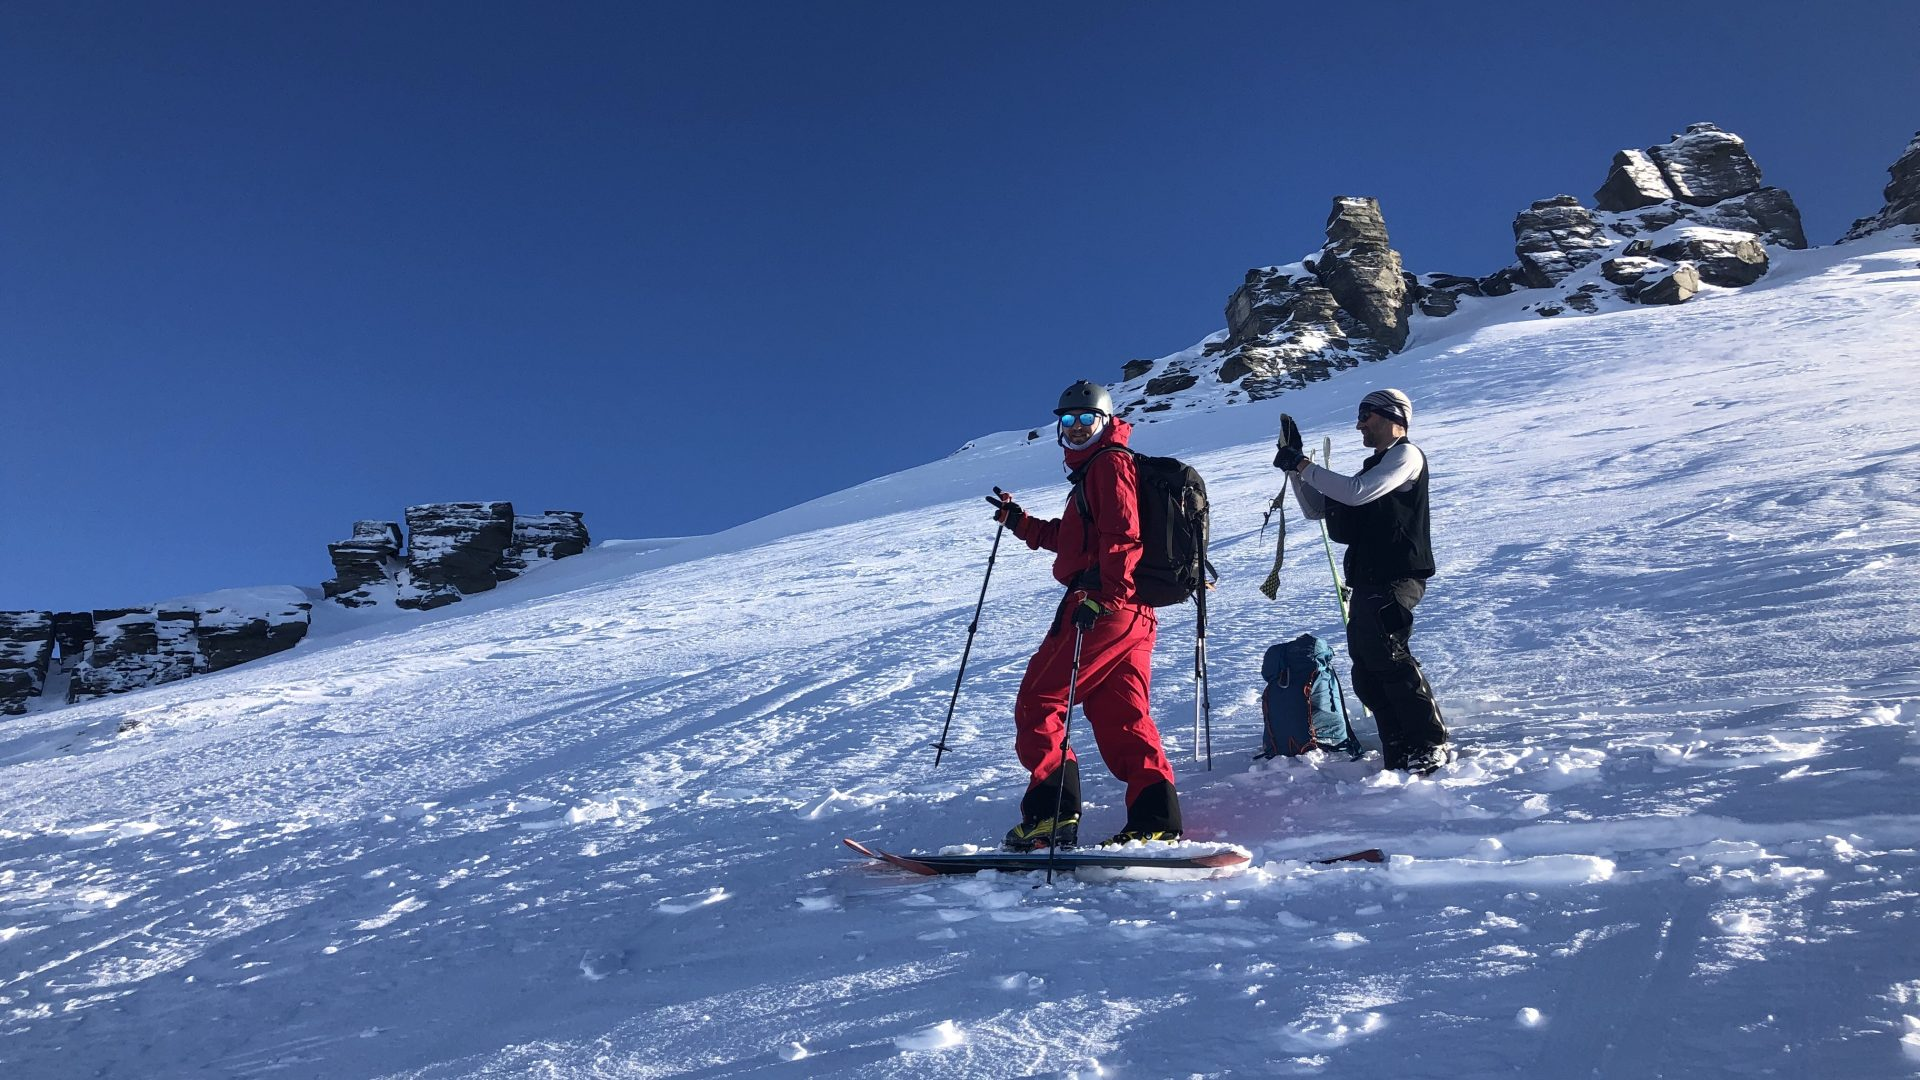 Daily Ski Touring - Local